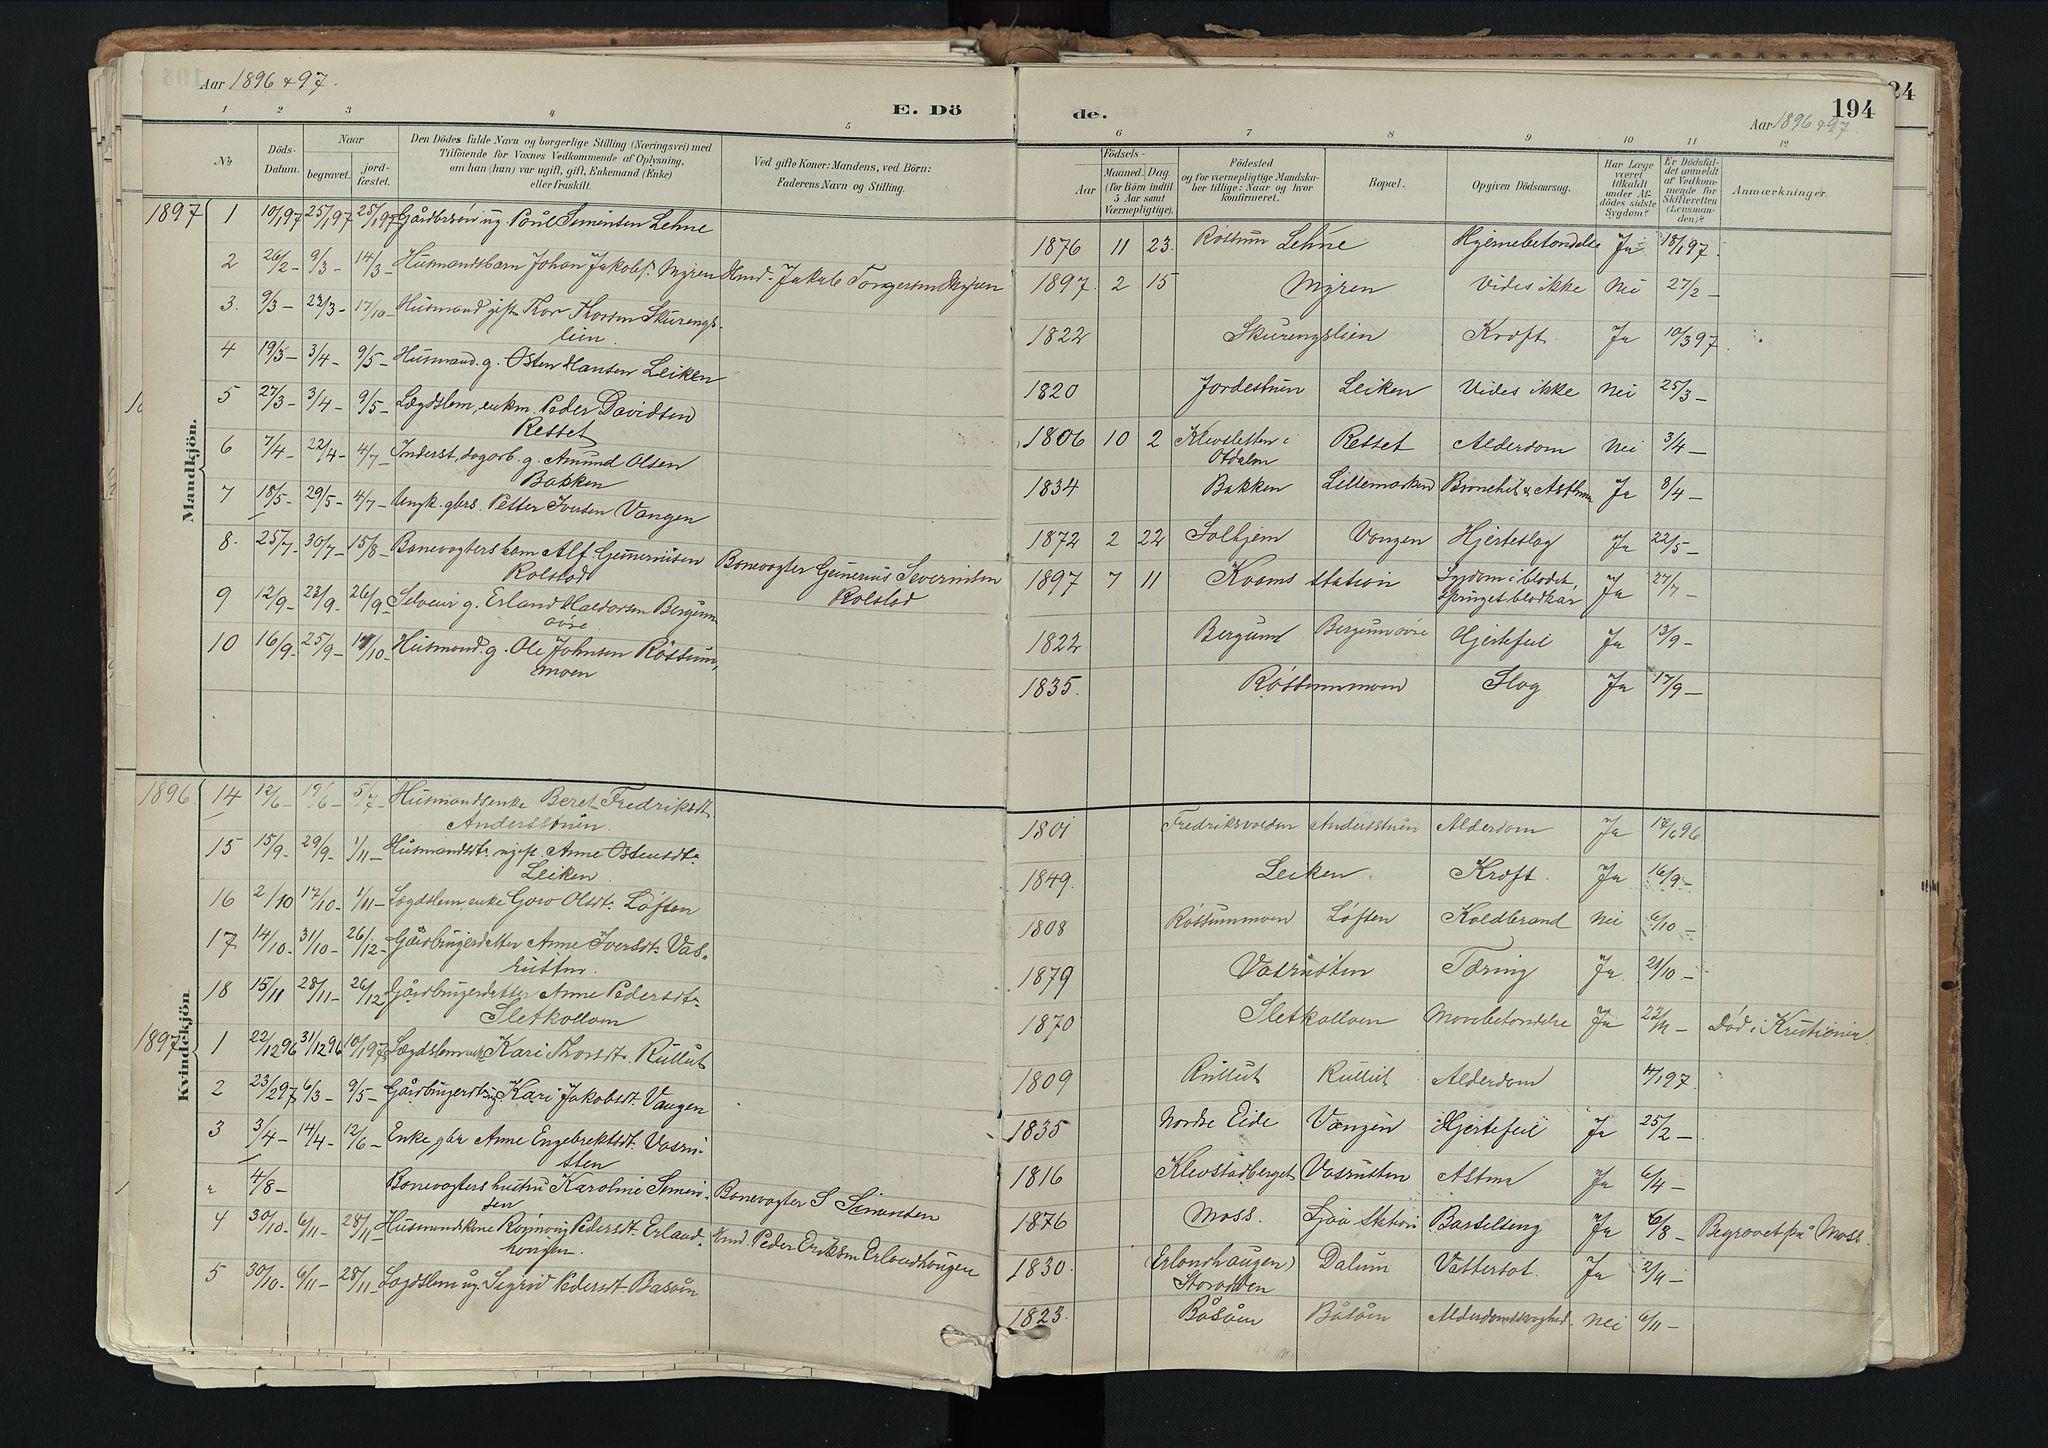 SAH, Nord-Fron prestekontor, Ministerialbok nr. 3, 1884-1914, s. 194